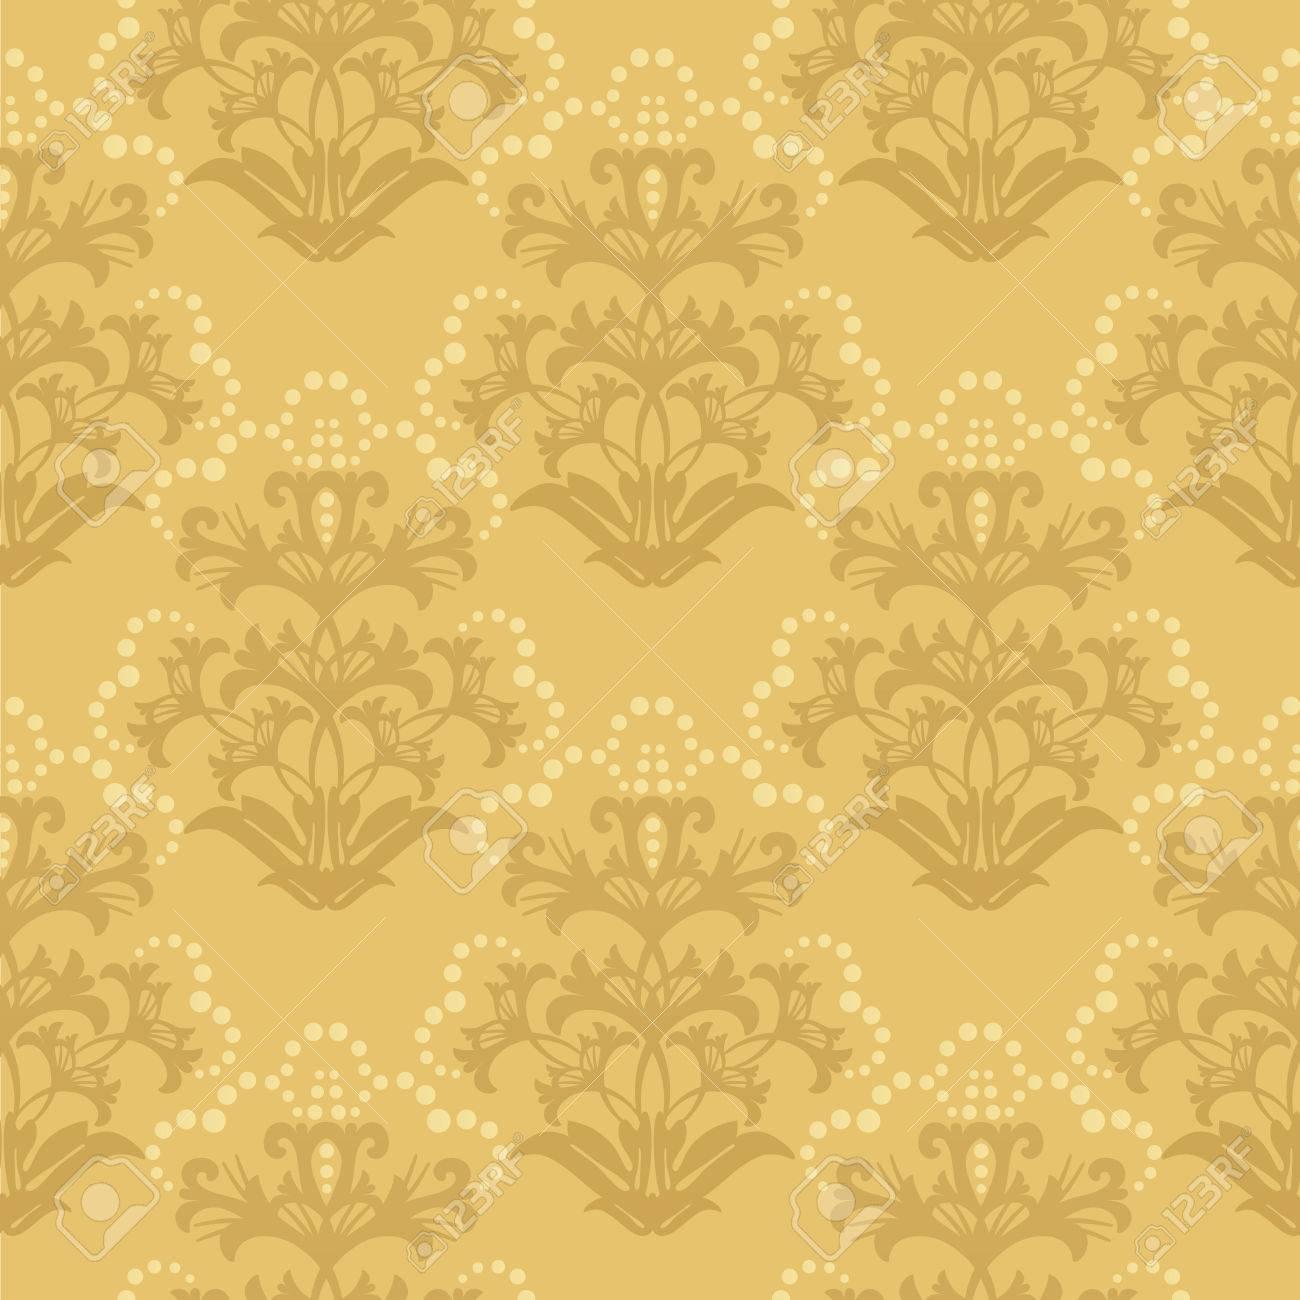 Seamless Golden Floral Wallpaper Stock Vector